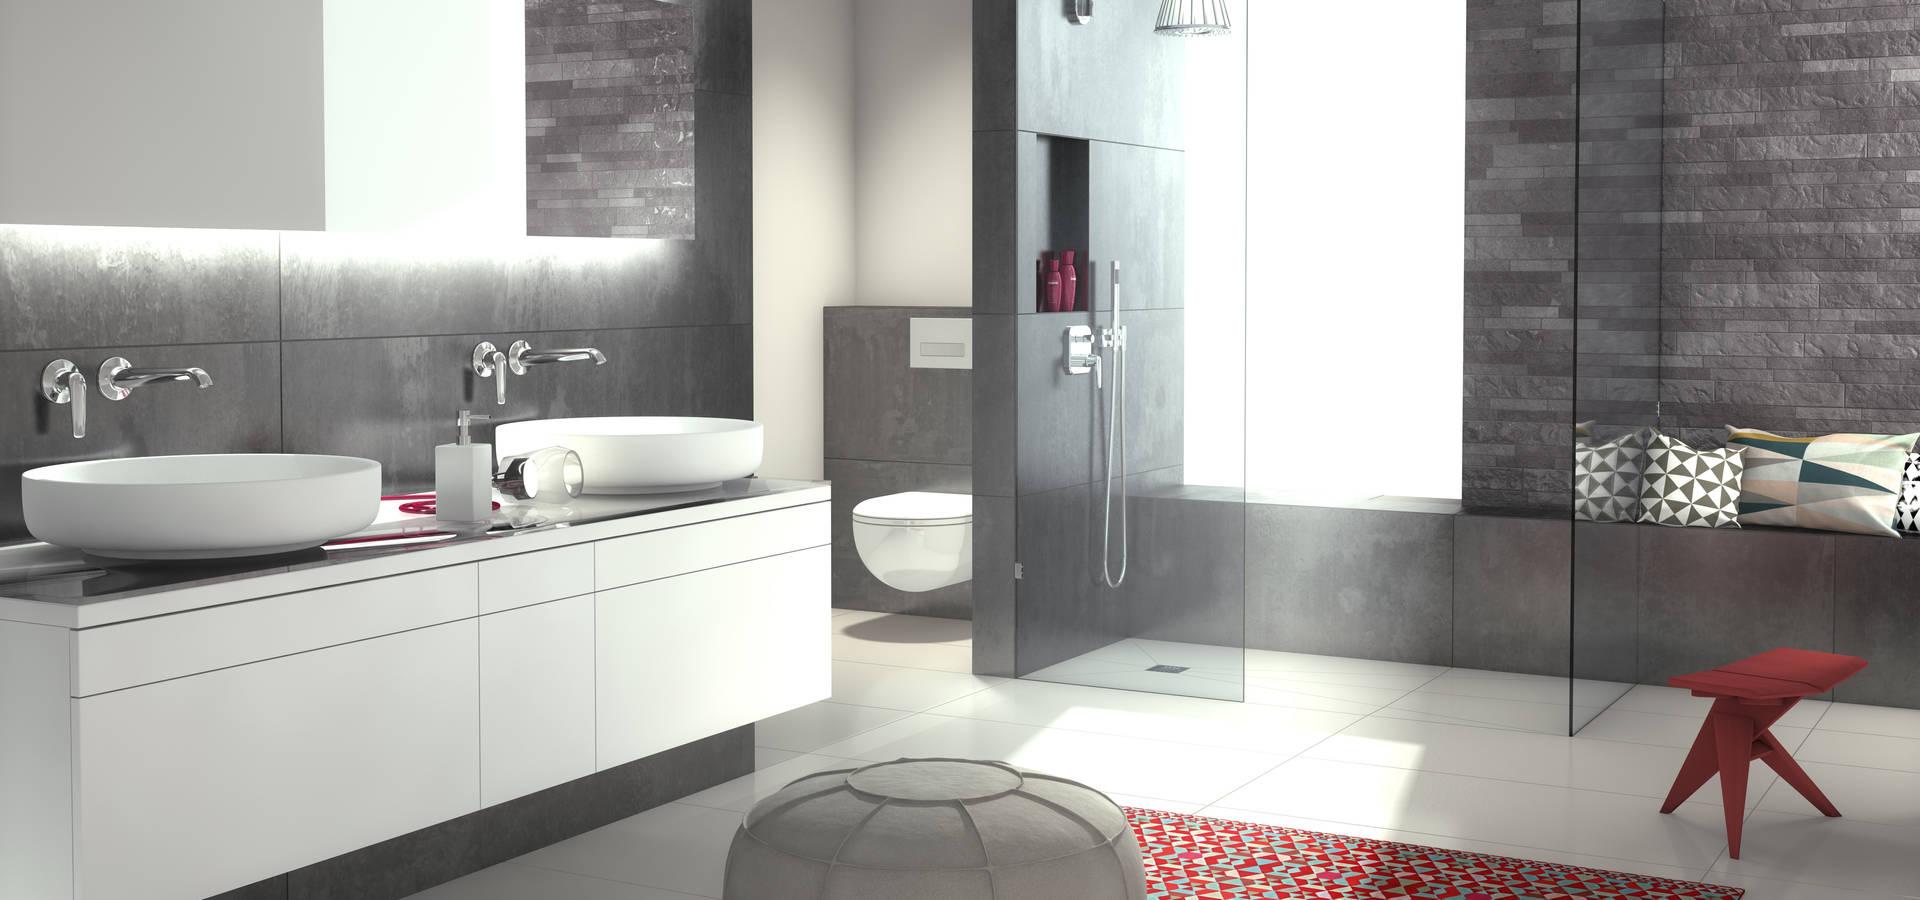 wedi bouwmaterialen in emsdetten homify. Black Bedroom Furniture Sets. Home Design Ideas